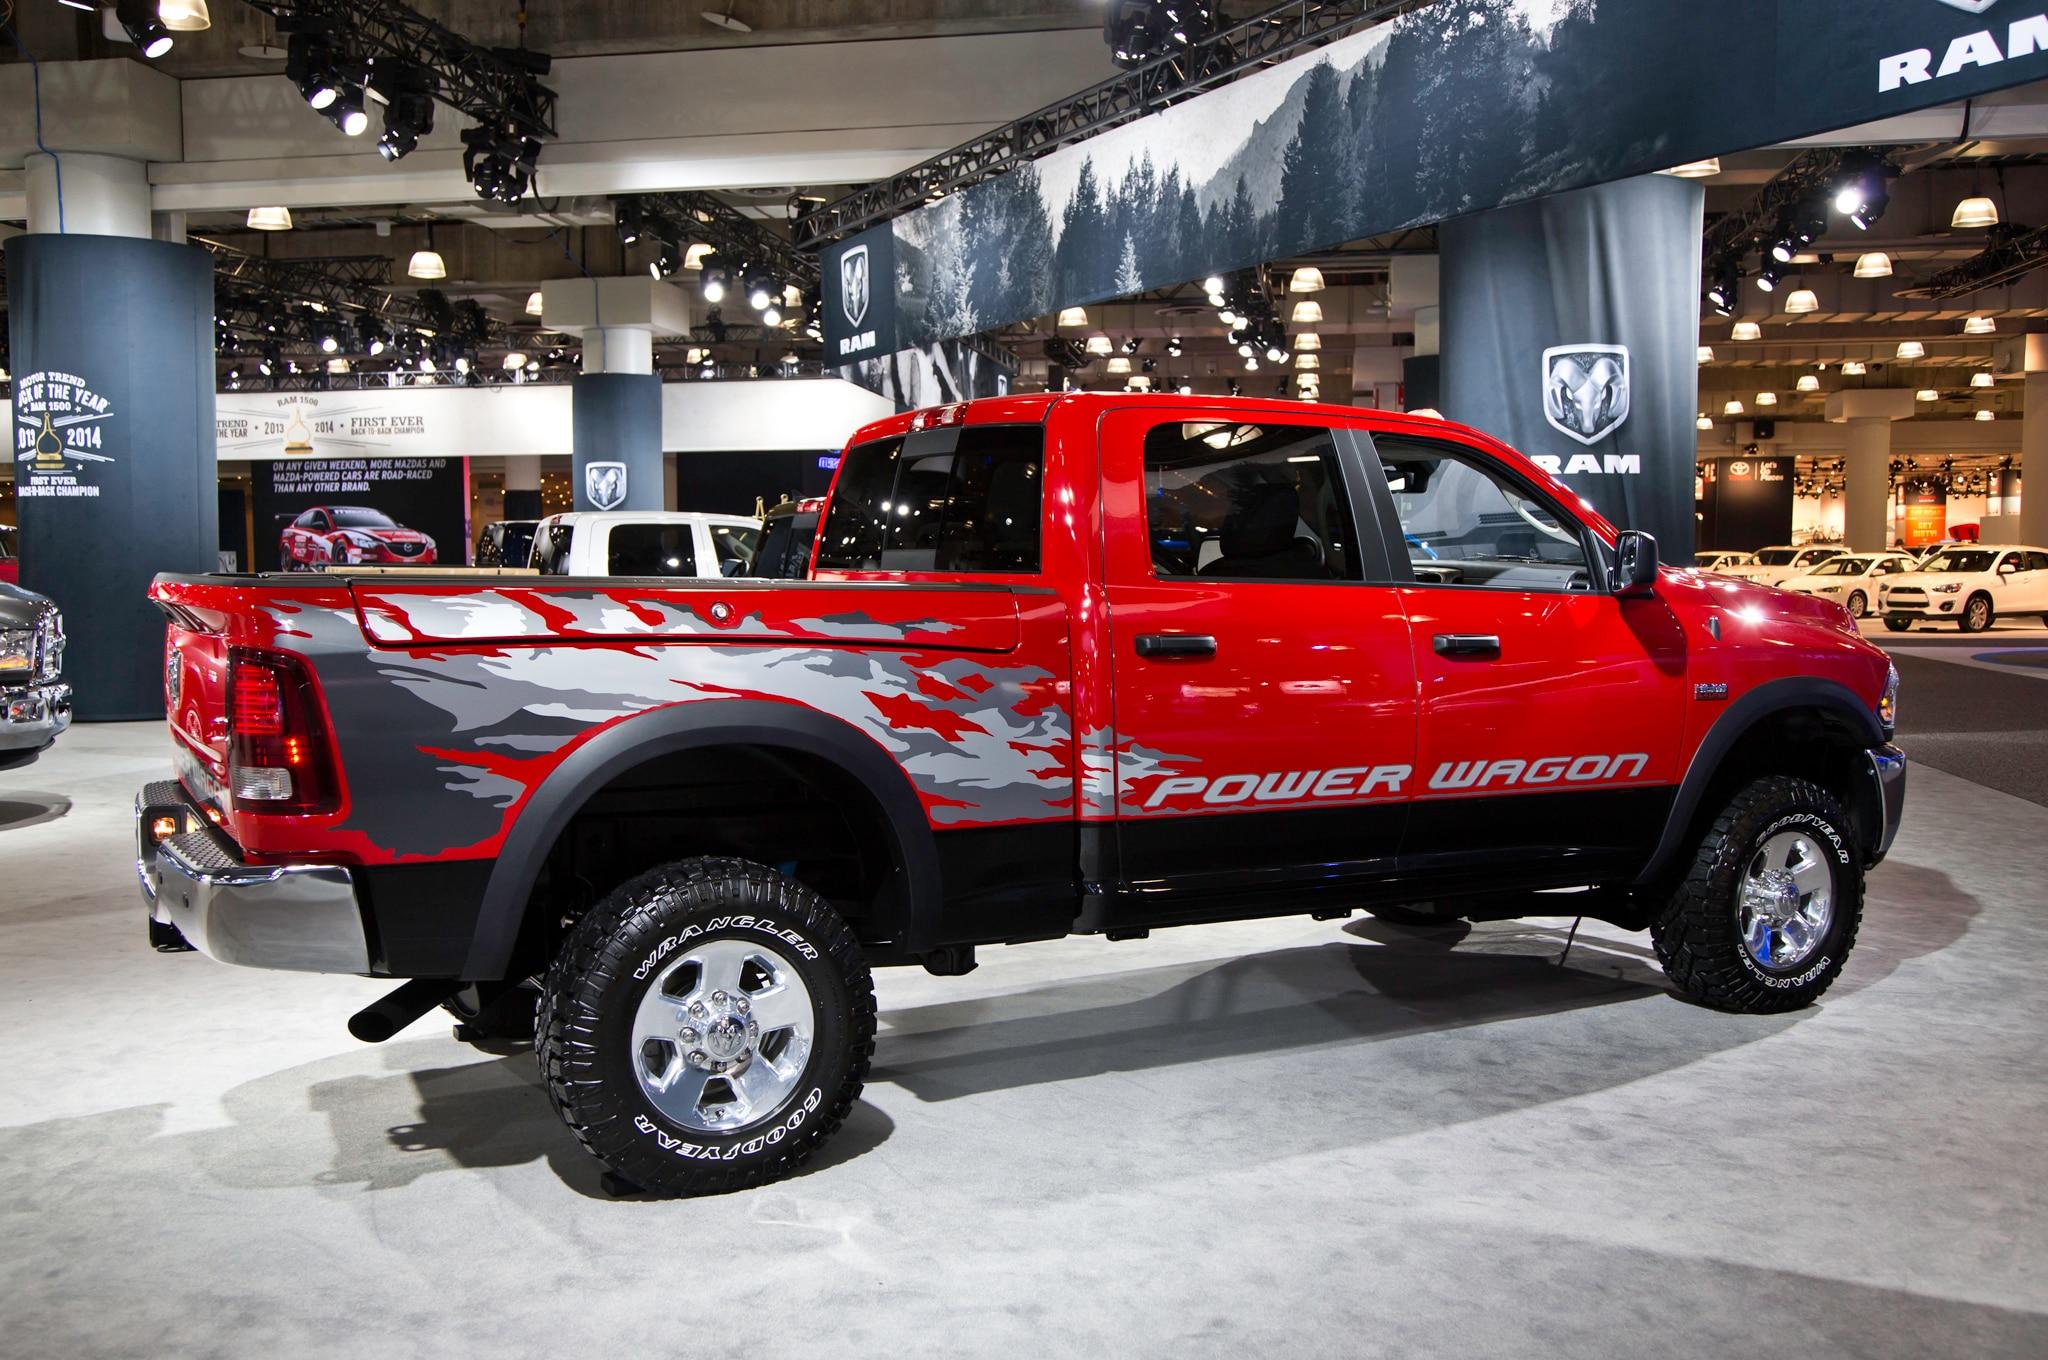 2014 ram power wagon gains more power capability automobile. Black Bedroom Furniture Sets. Home Design Ideas